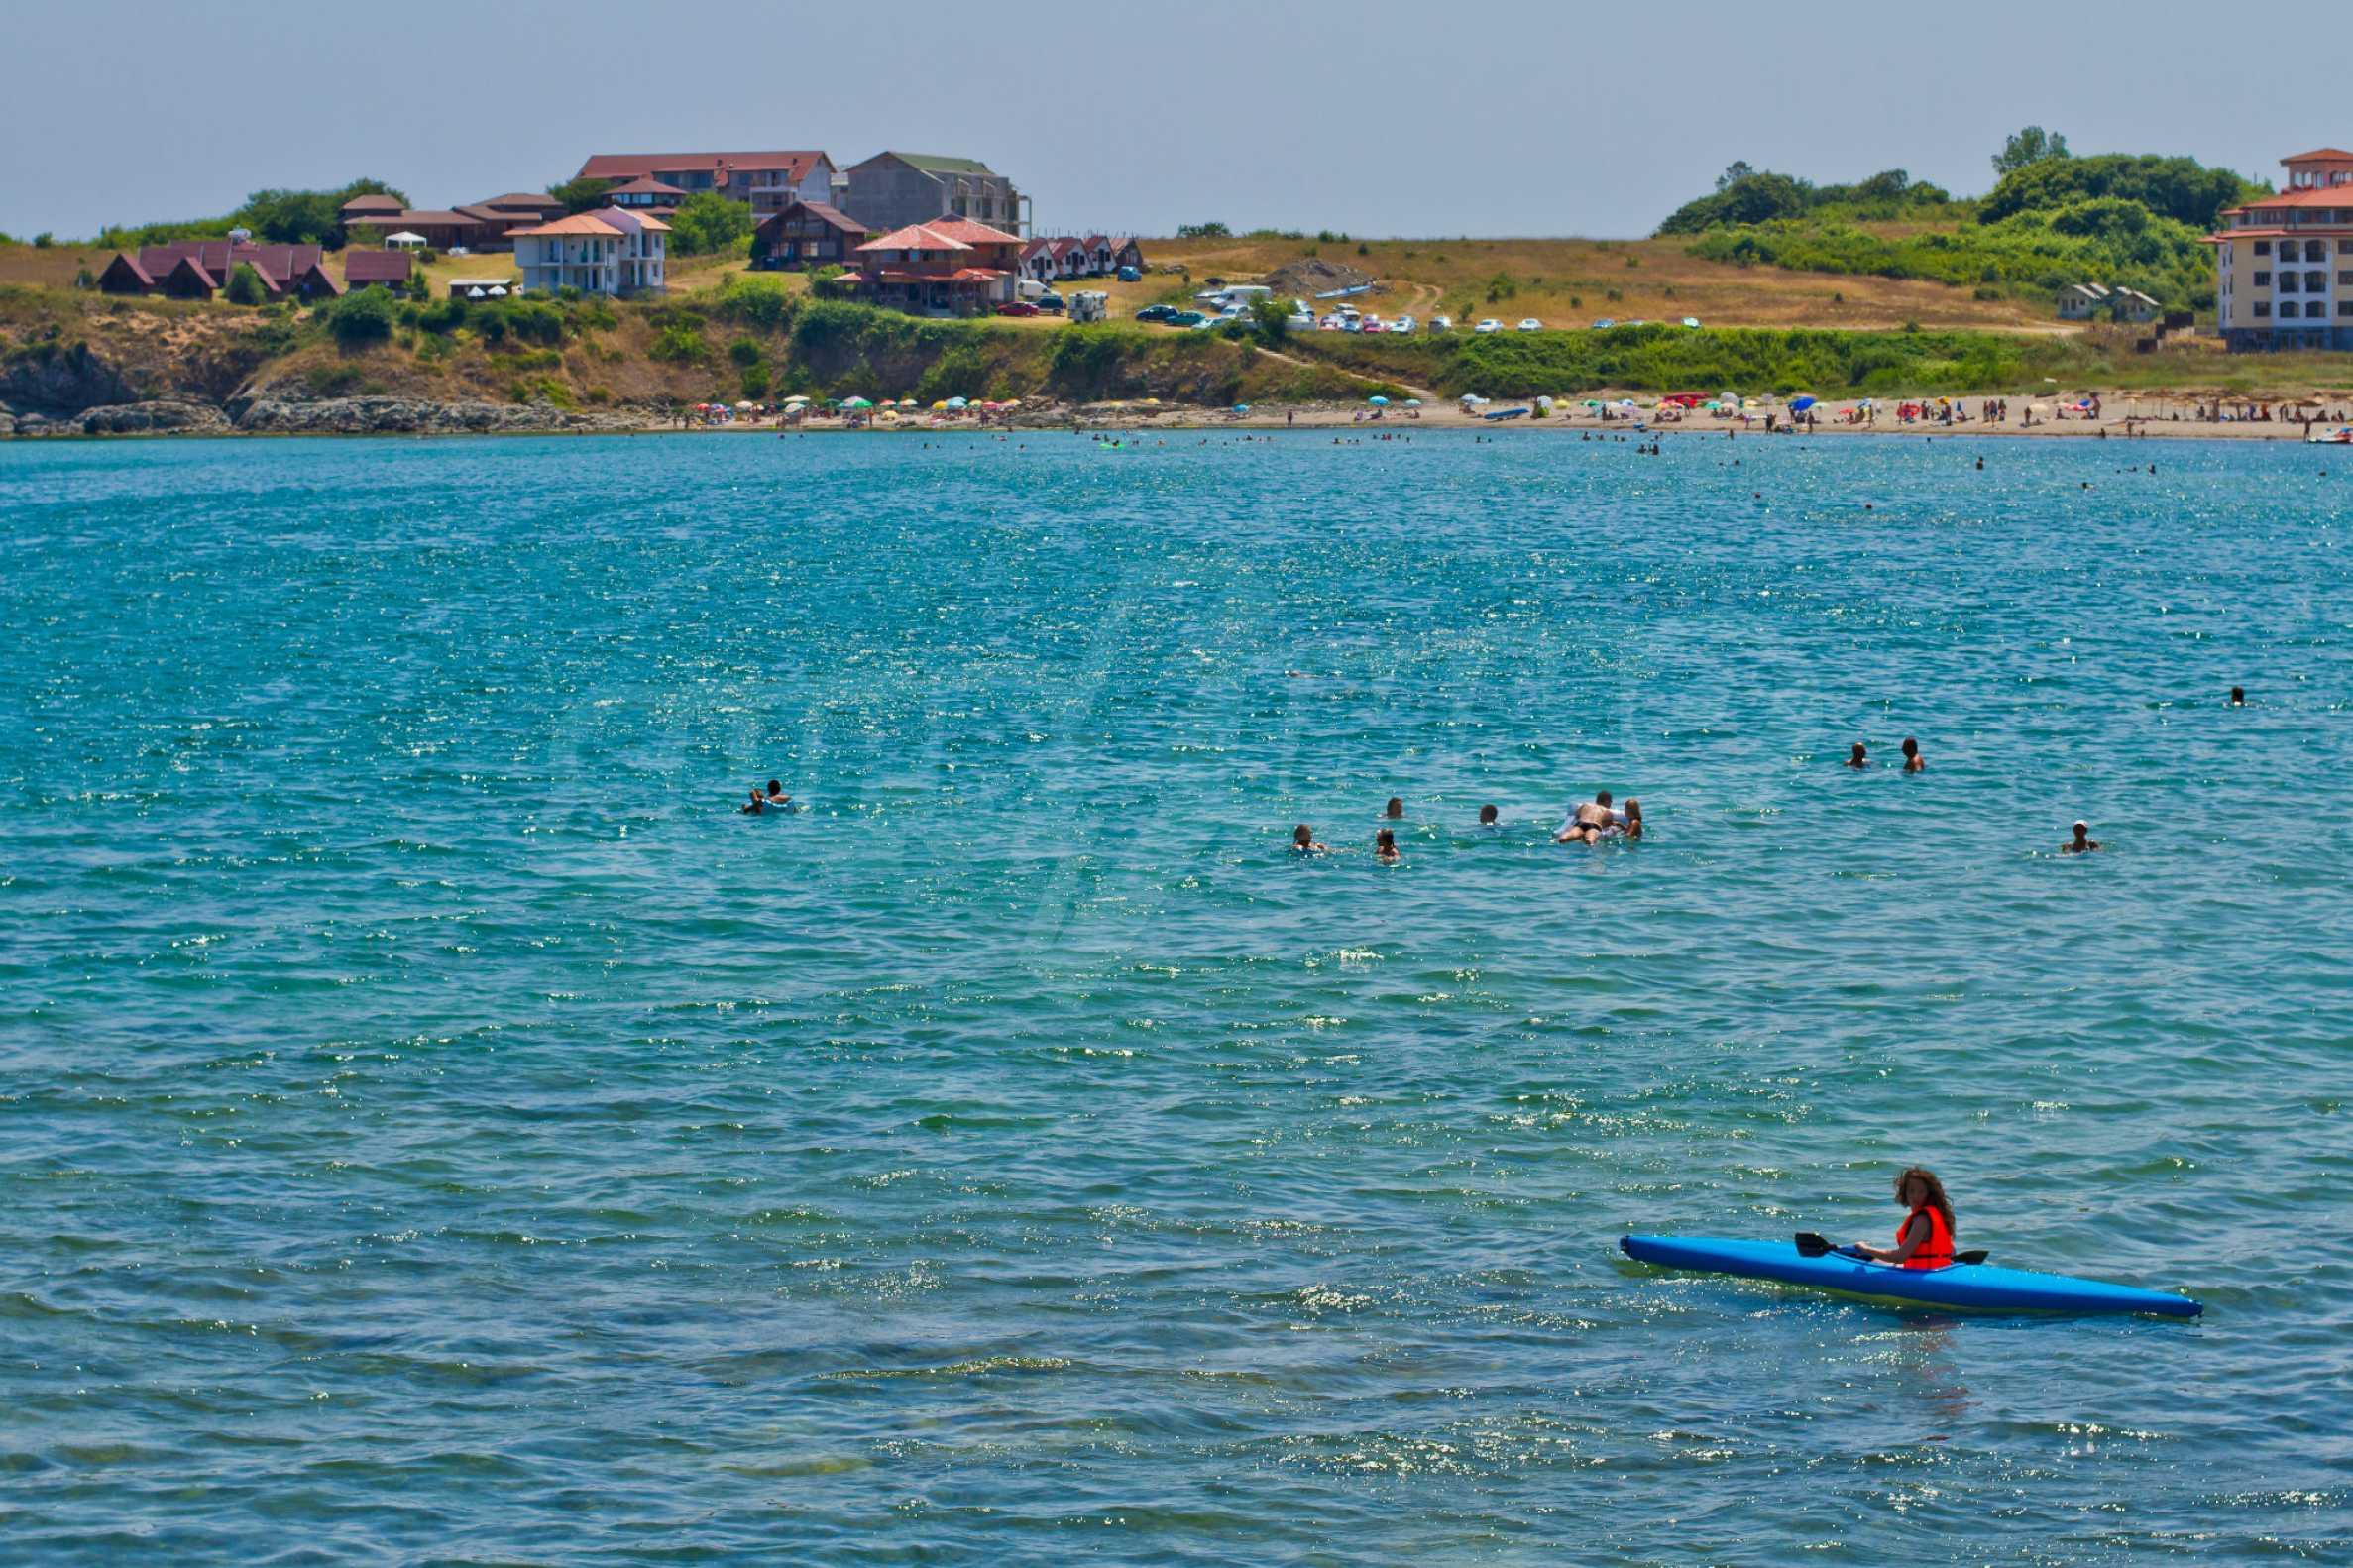 Примеа Бийч Резиденс / Primea Beach Residence 16